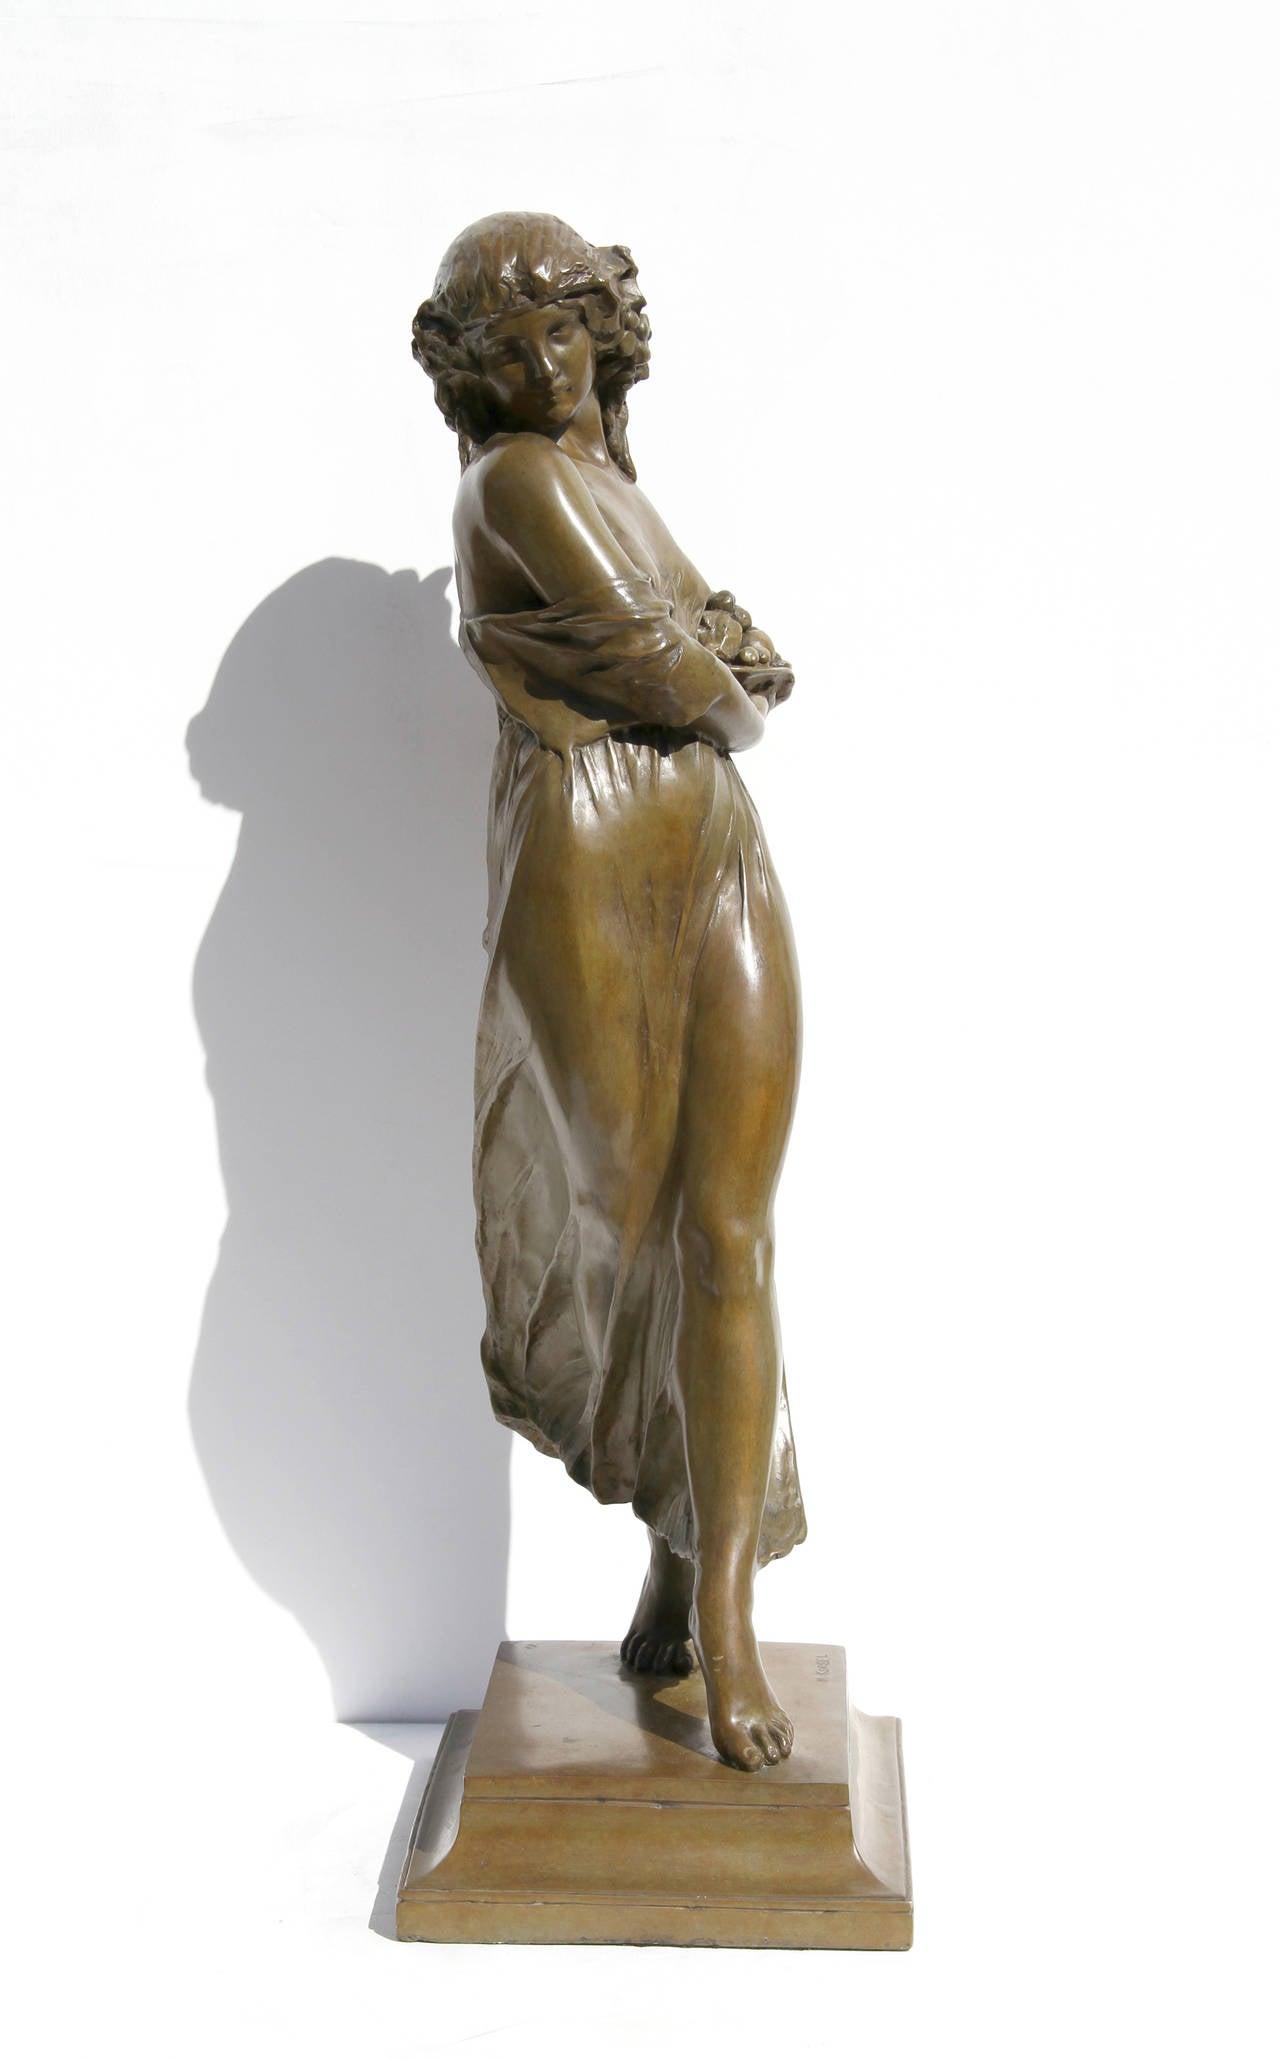 Woman Carrying Grapes - Sculpture by Mario Joseph Korbel